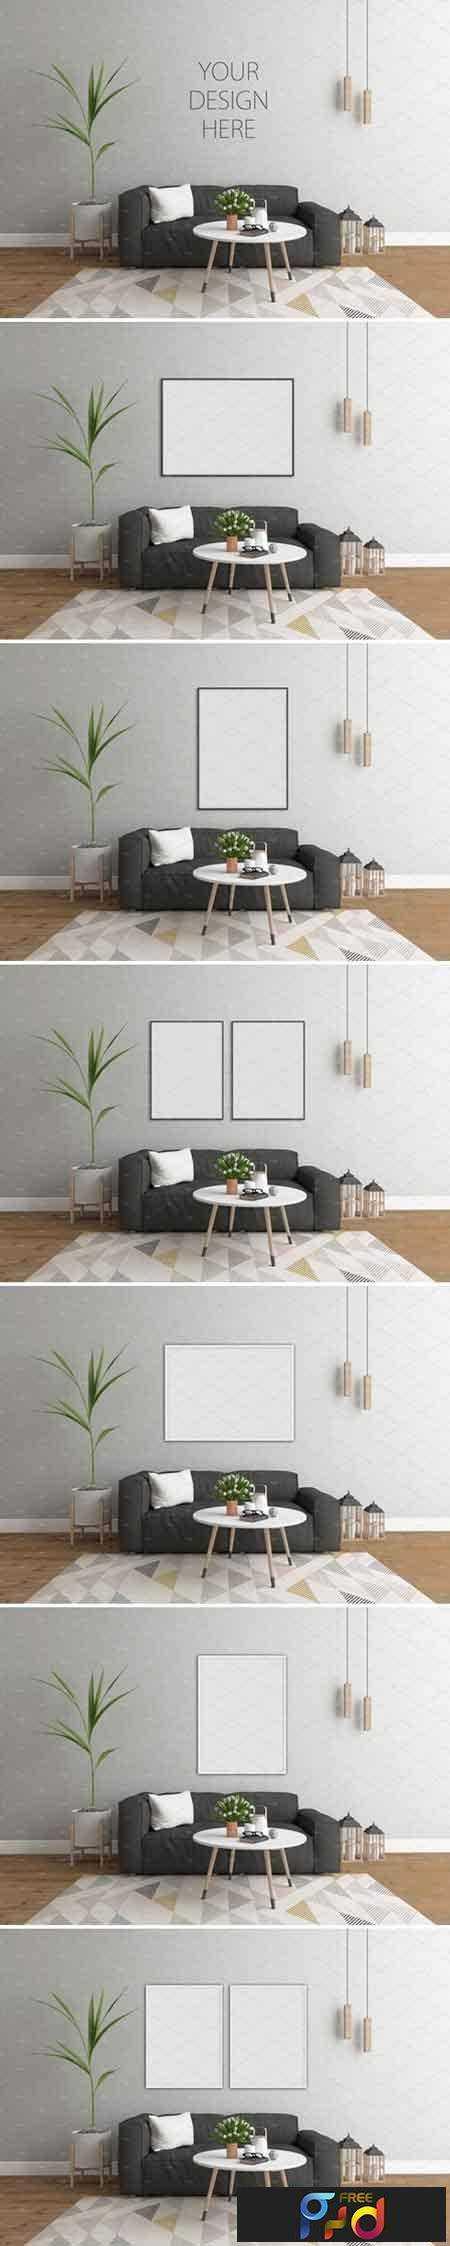 1709029 Interior mockup - scandinavian room 2072172 1